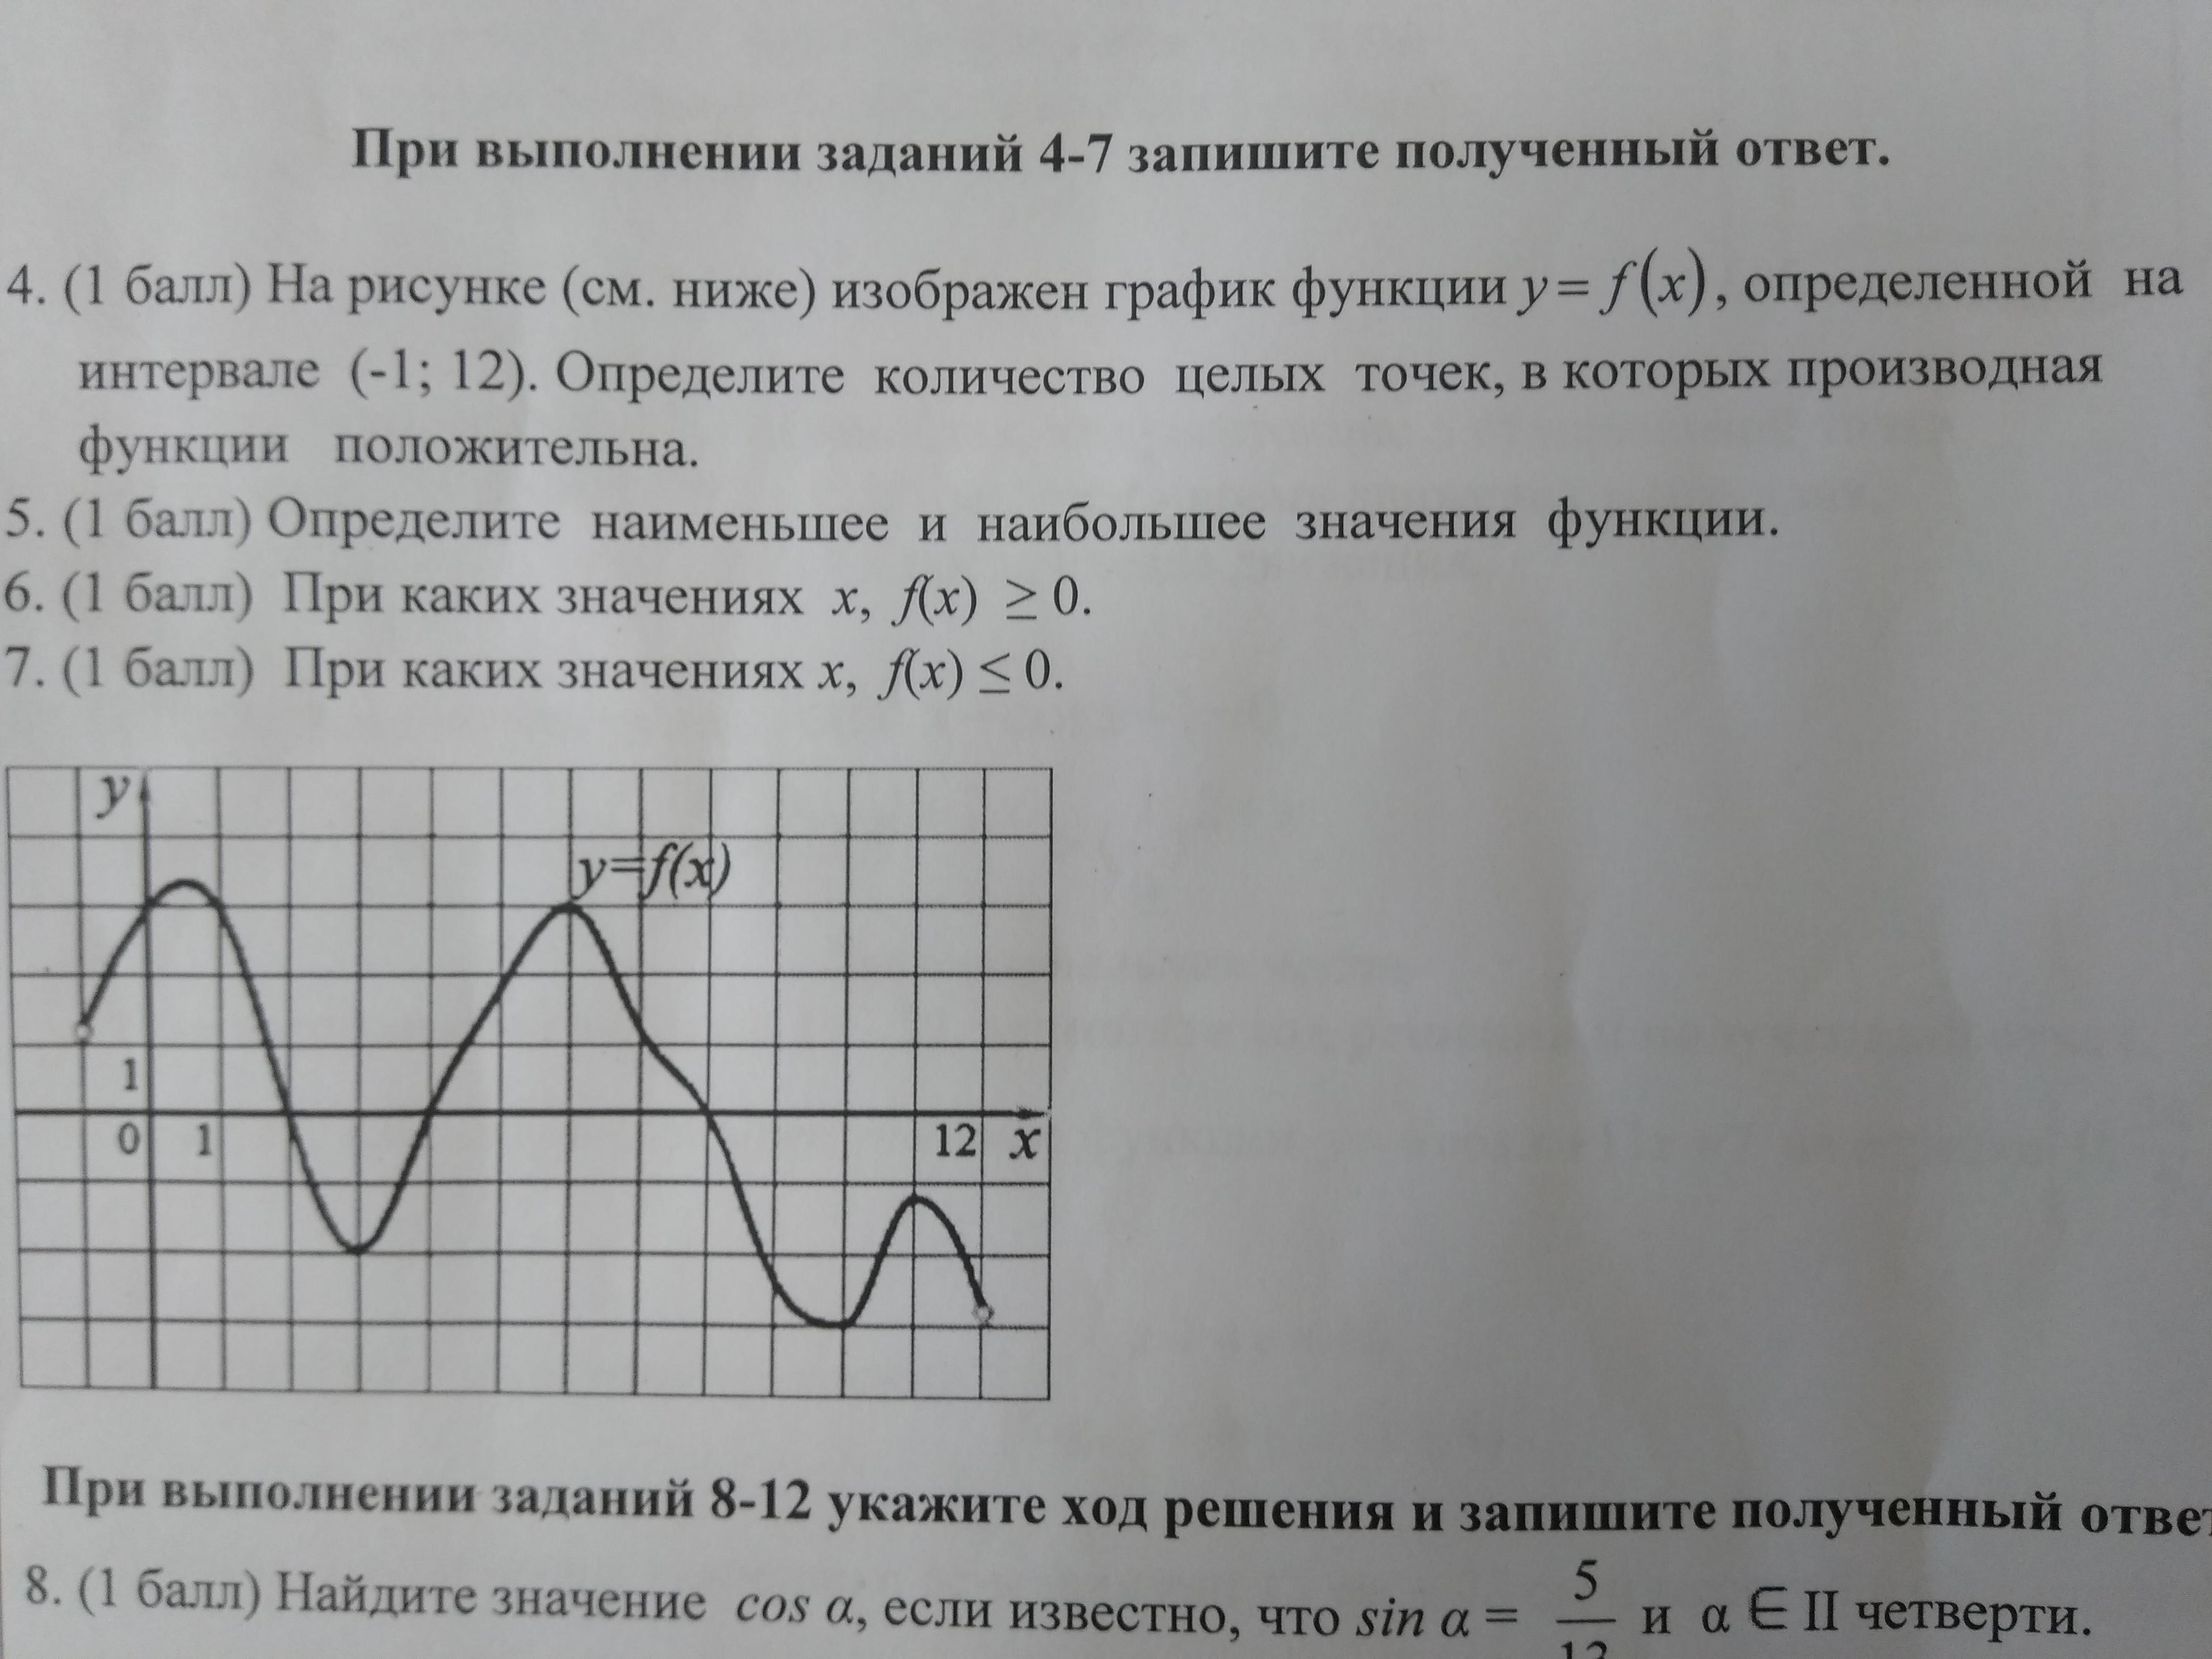 На рисунке изображен график функции y=f(x)...